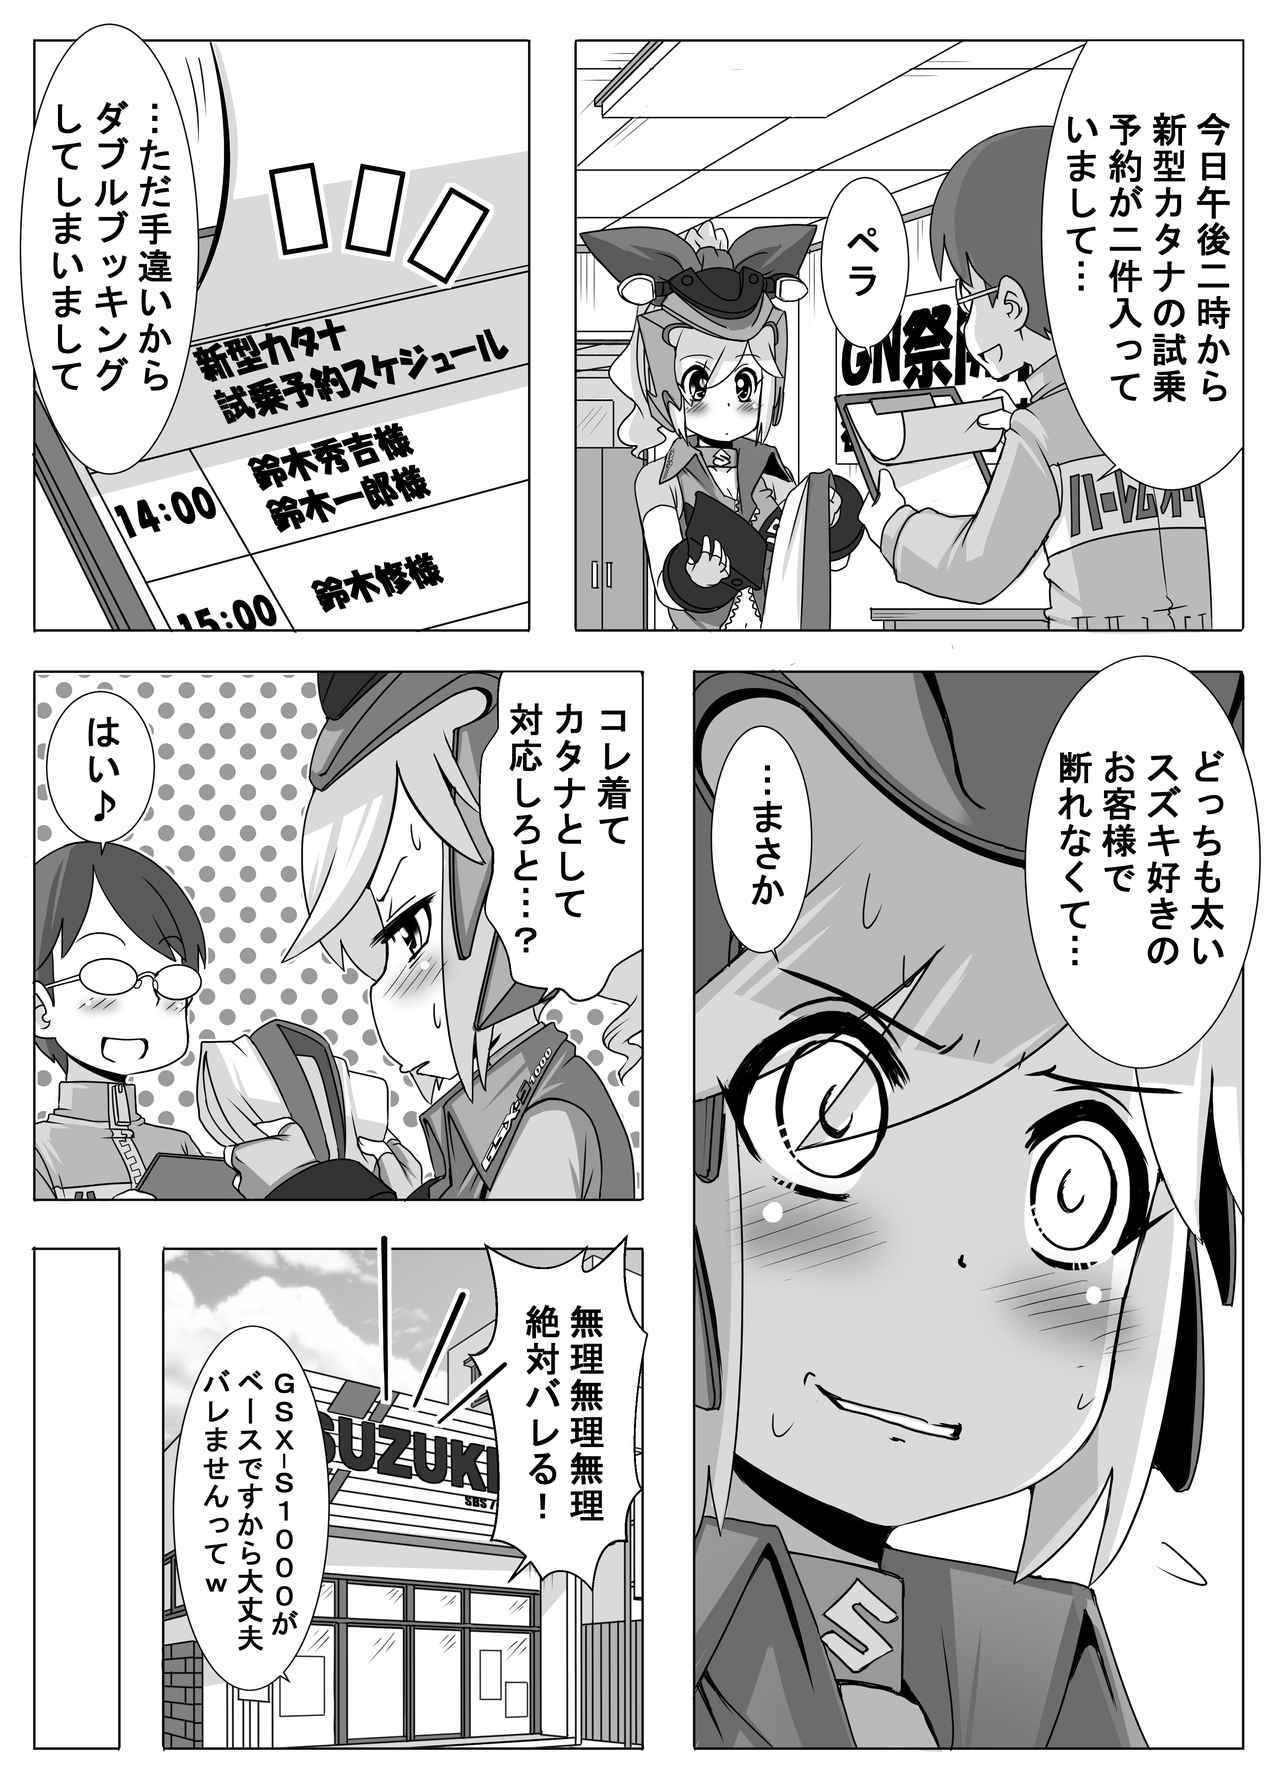 画像2: 『バイク擬人化菌書』GSX-S1000 話「代役」 作:鈴木秀吉